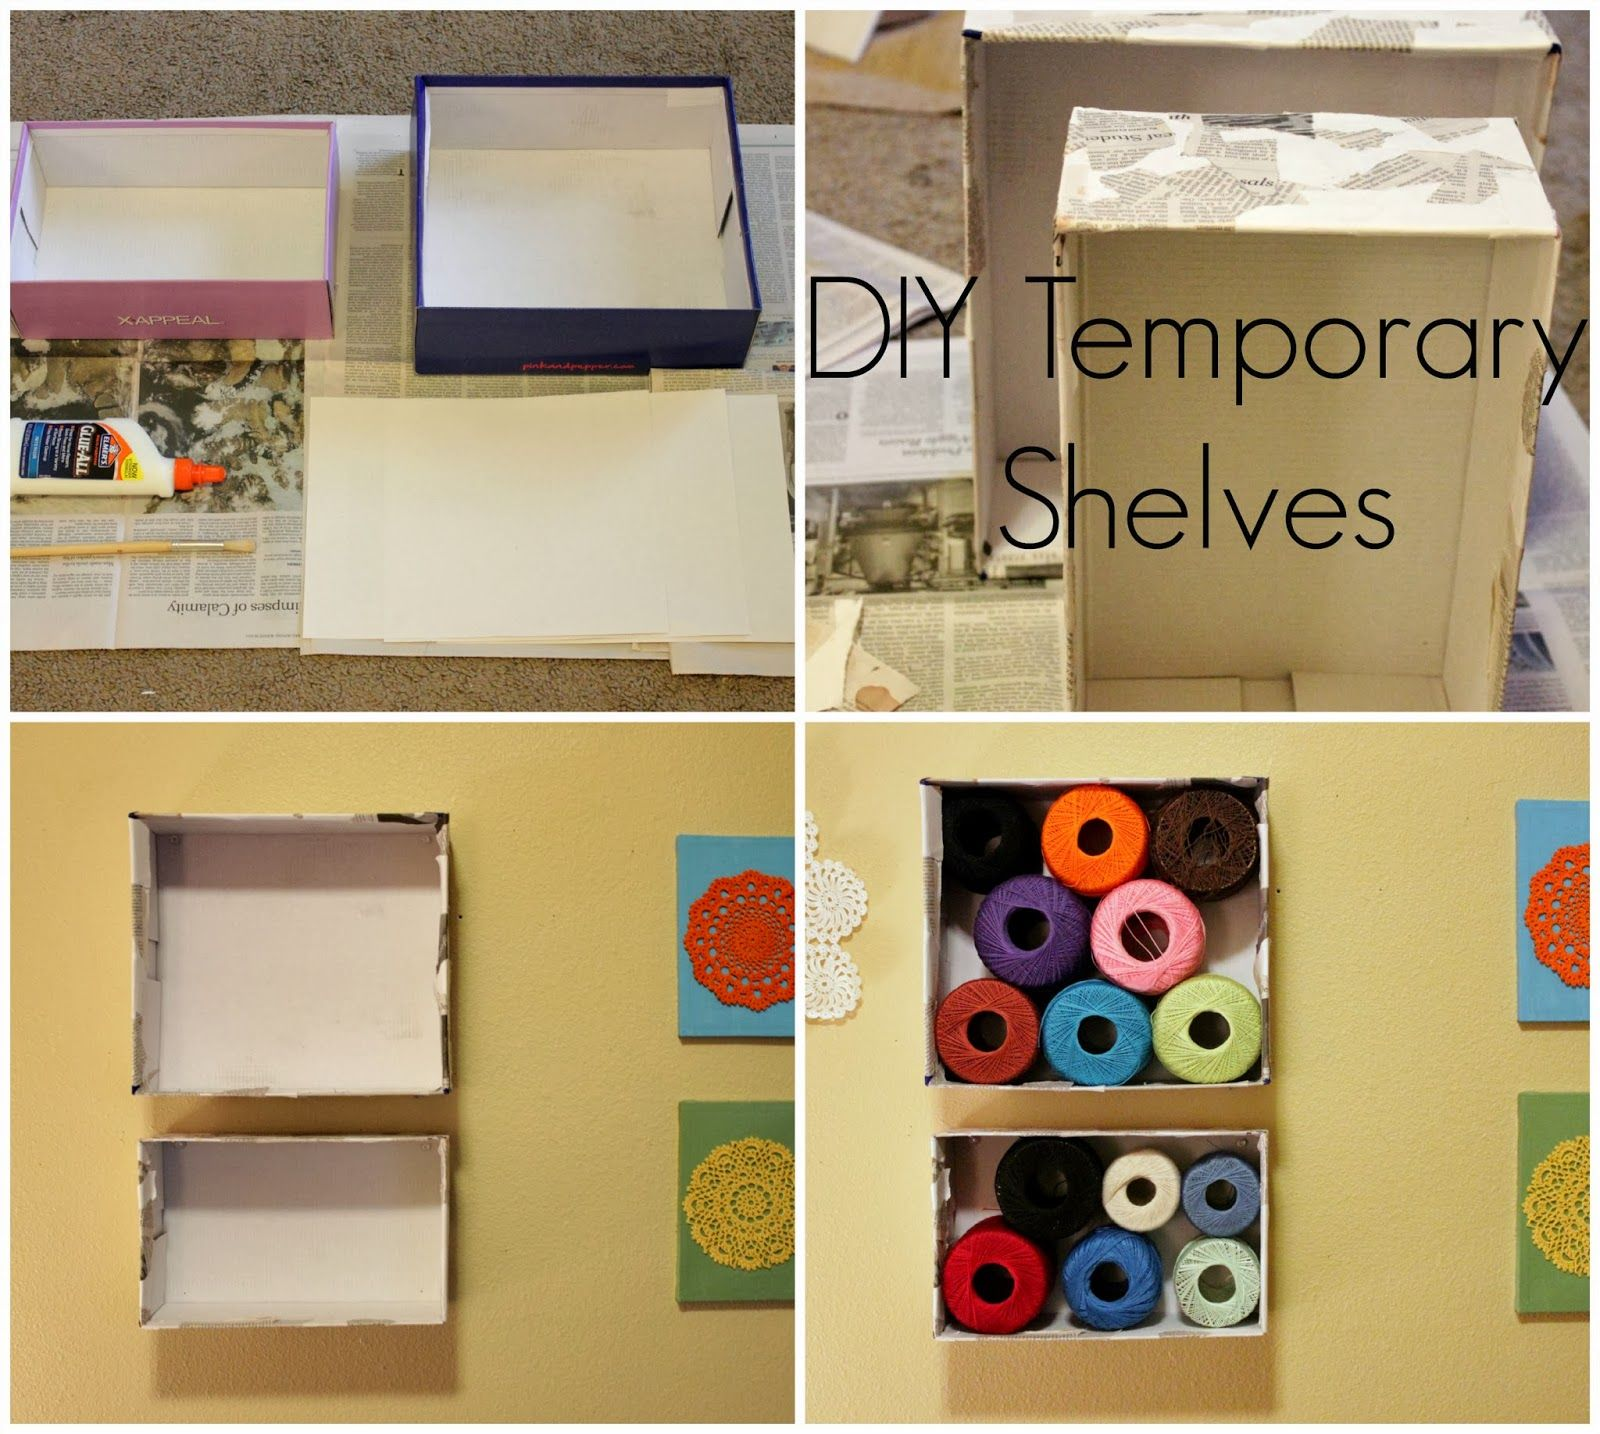 DIY Temporary Shelves | DIY | Pinterest | Shelves, Apartments and ...